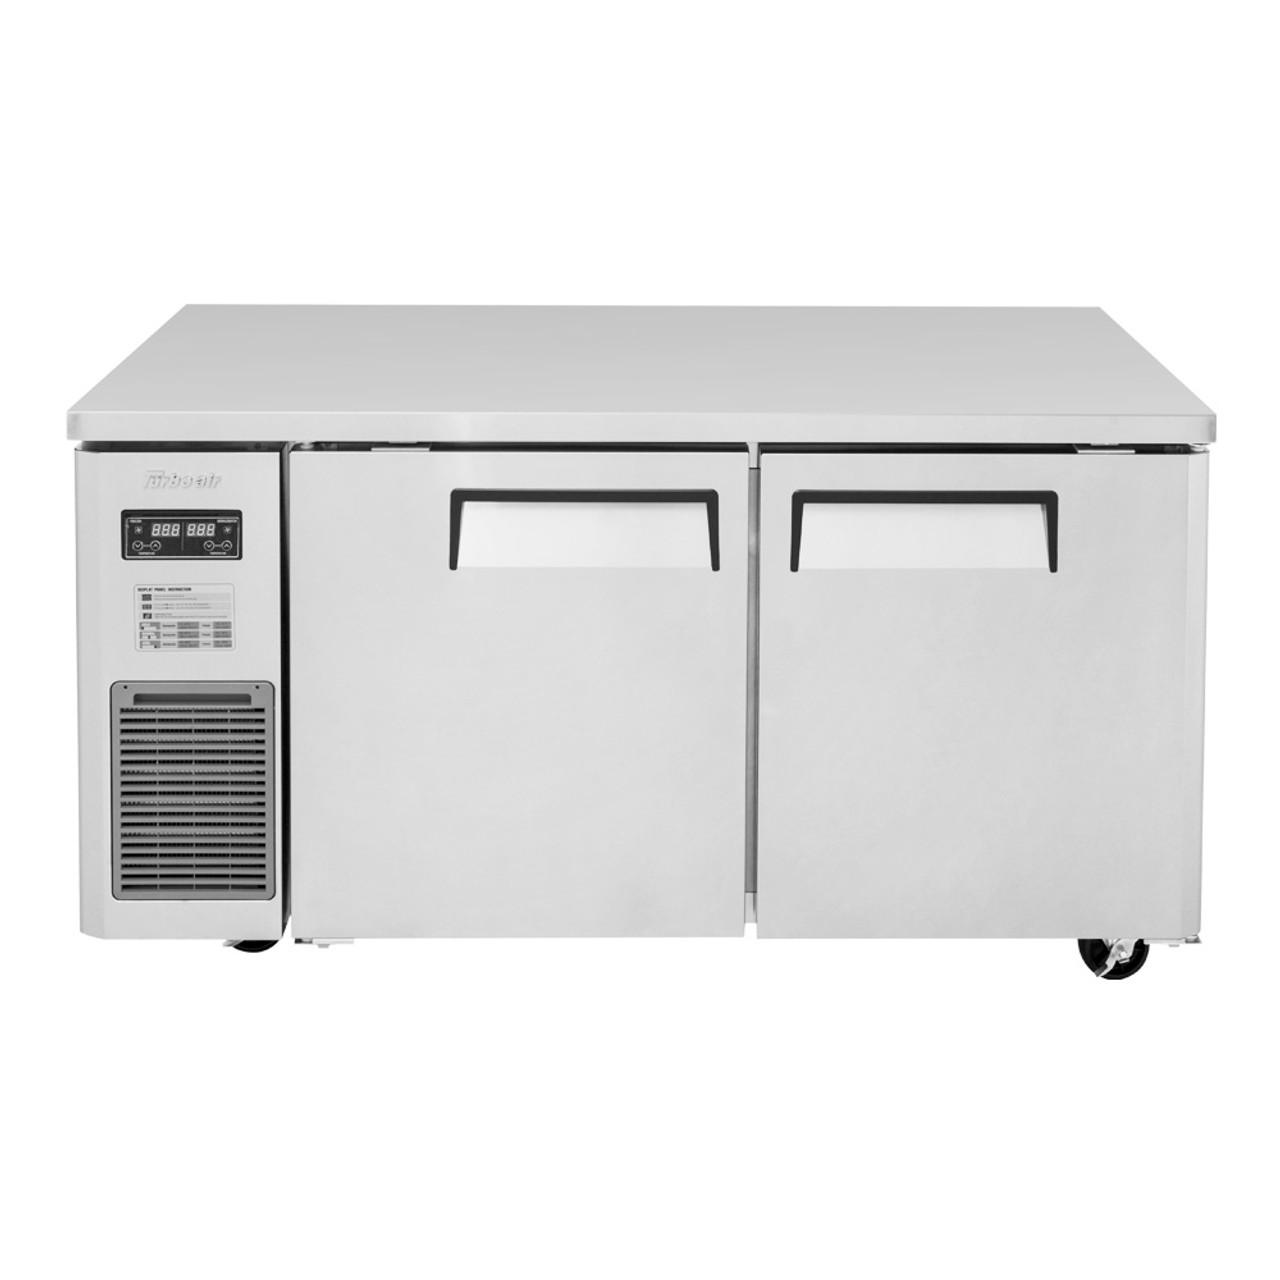 72 in Dual Temp Undercounter Refrigerator Turbo Air JURF-72-N